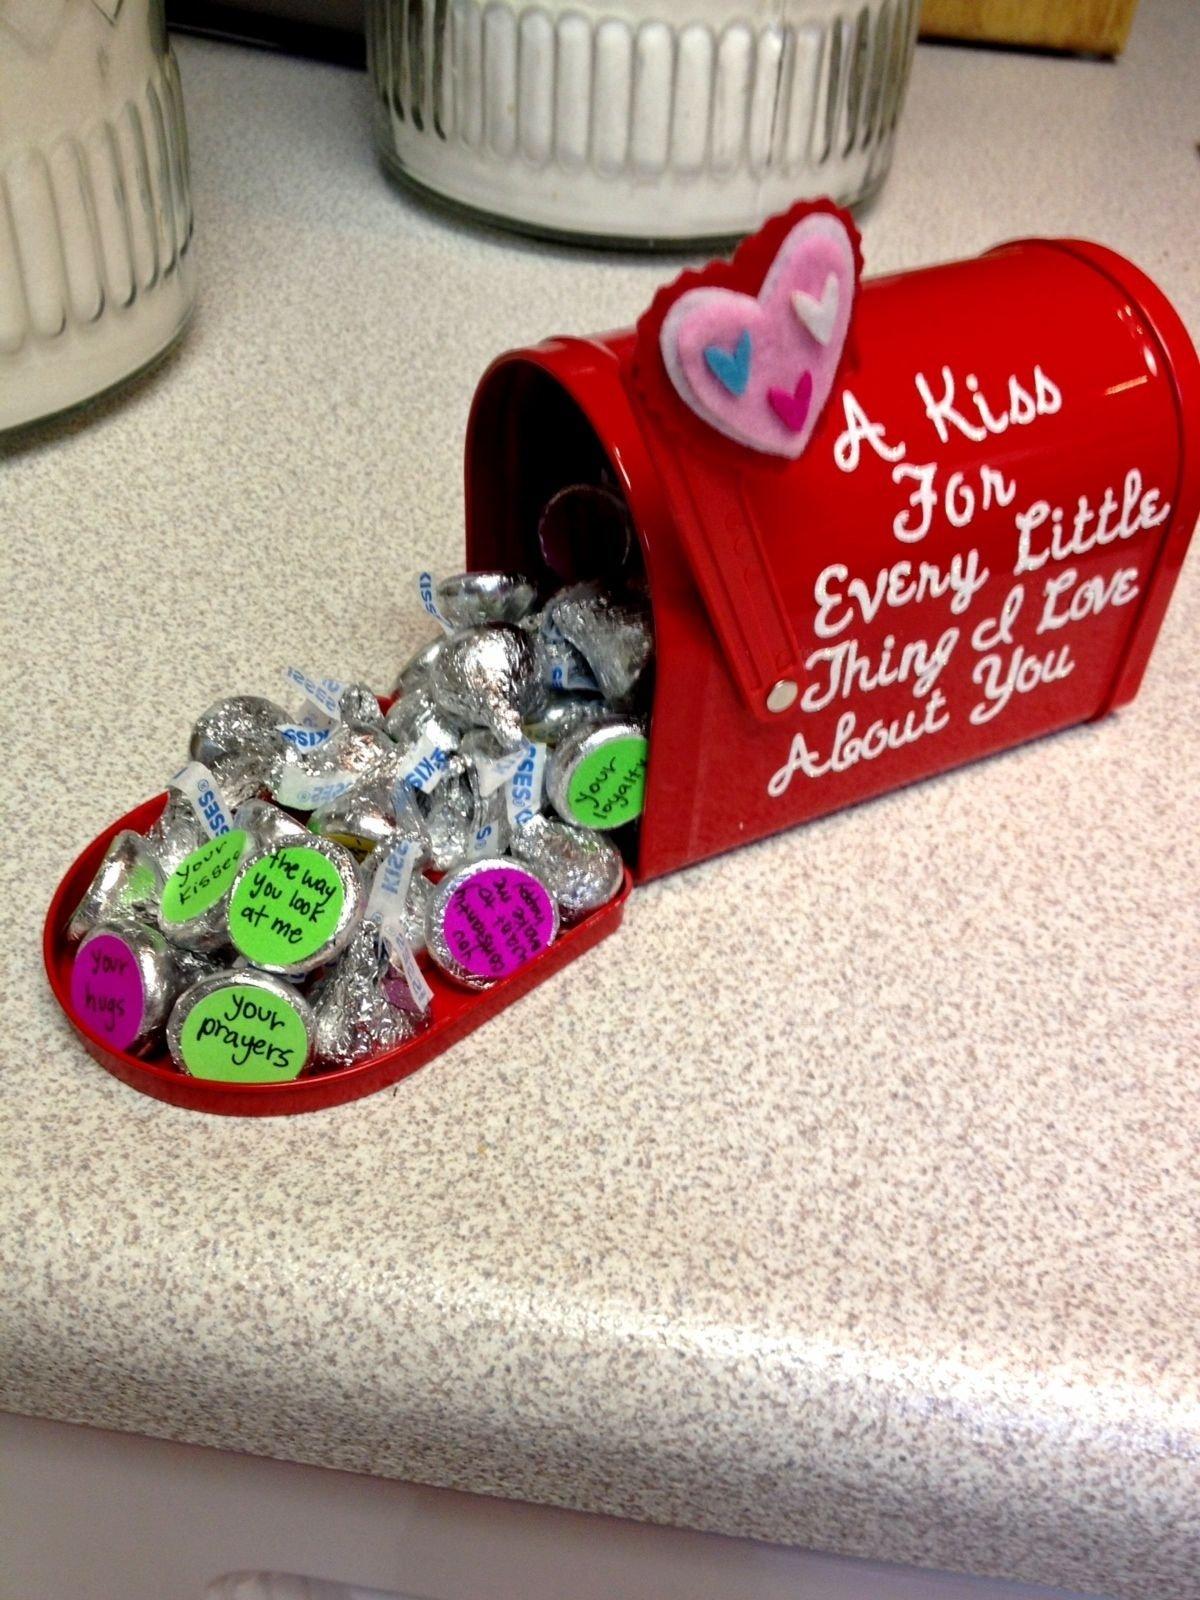 10 Amazing Valentine Craft Ideas For Him 55 diy valentine gifts for him creativity boyfriends and target 7 2020